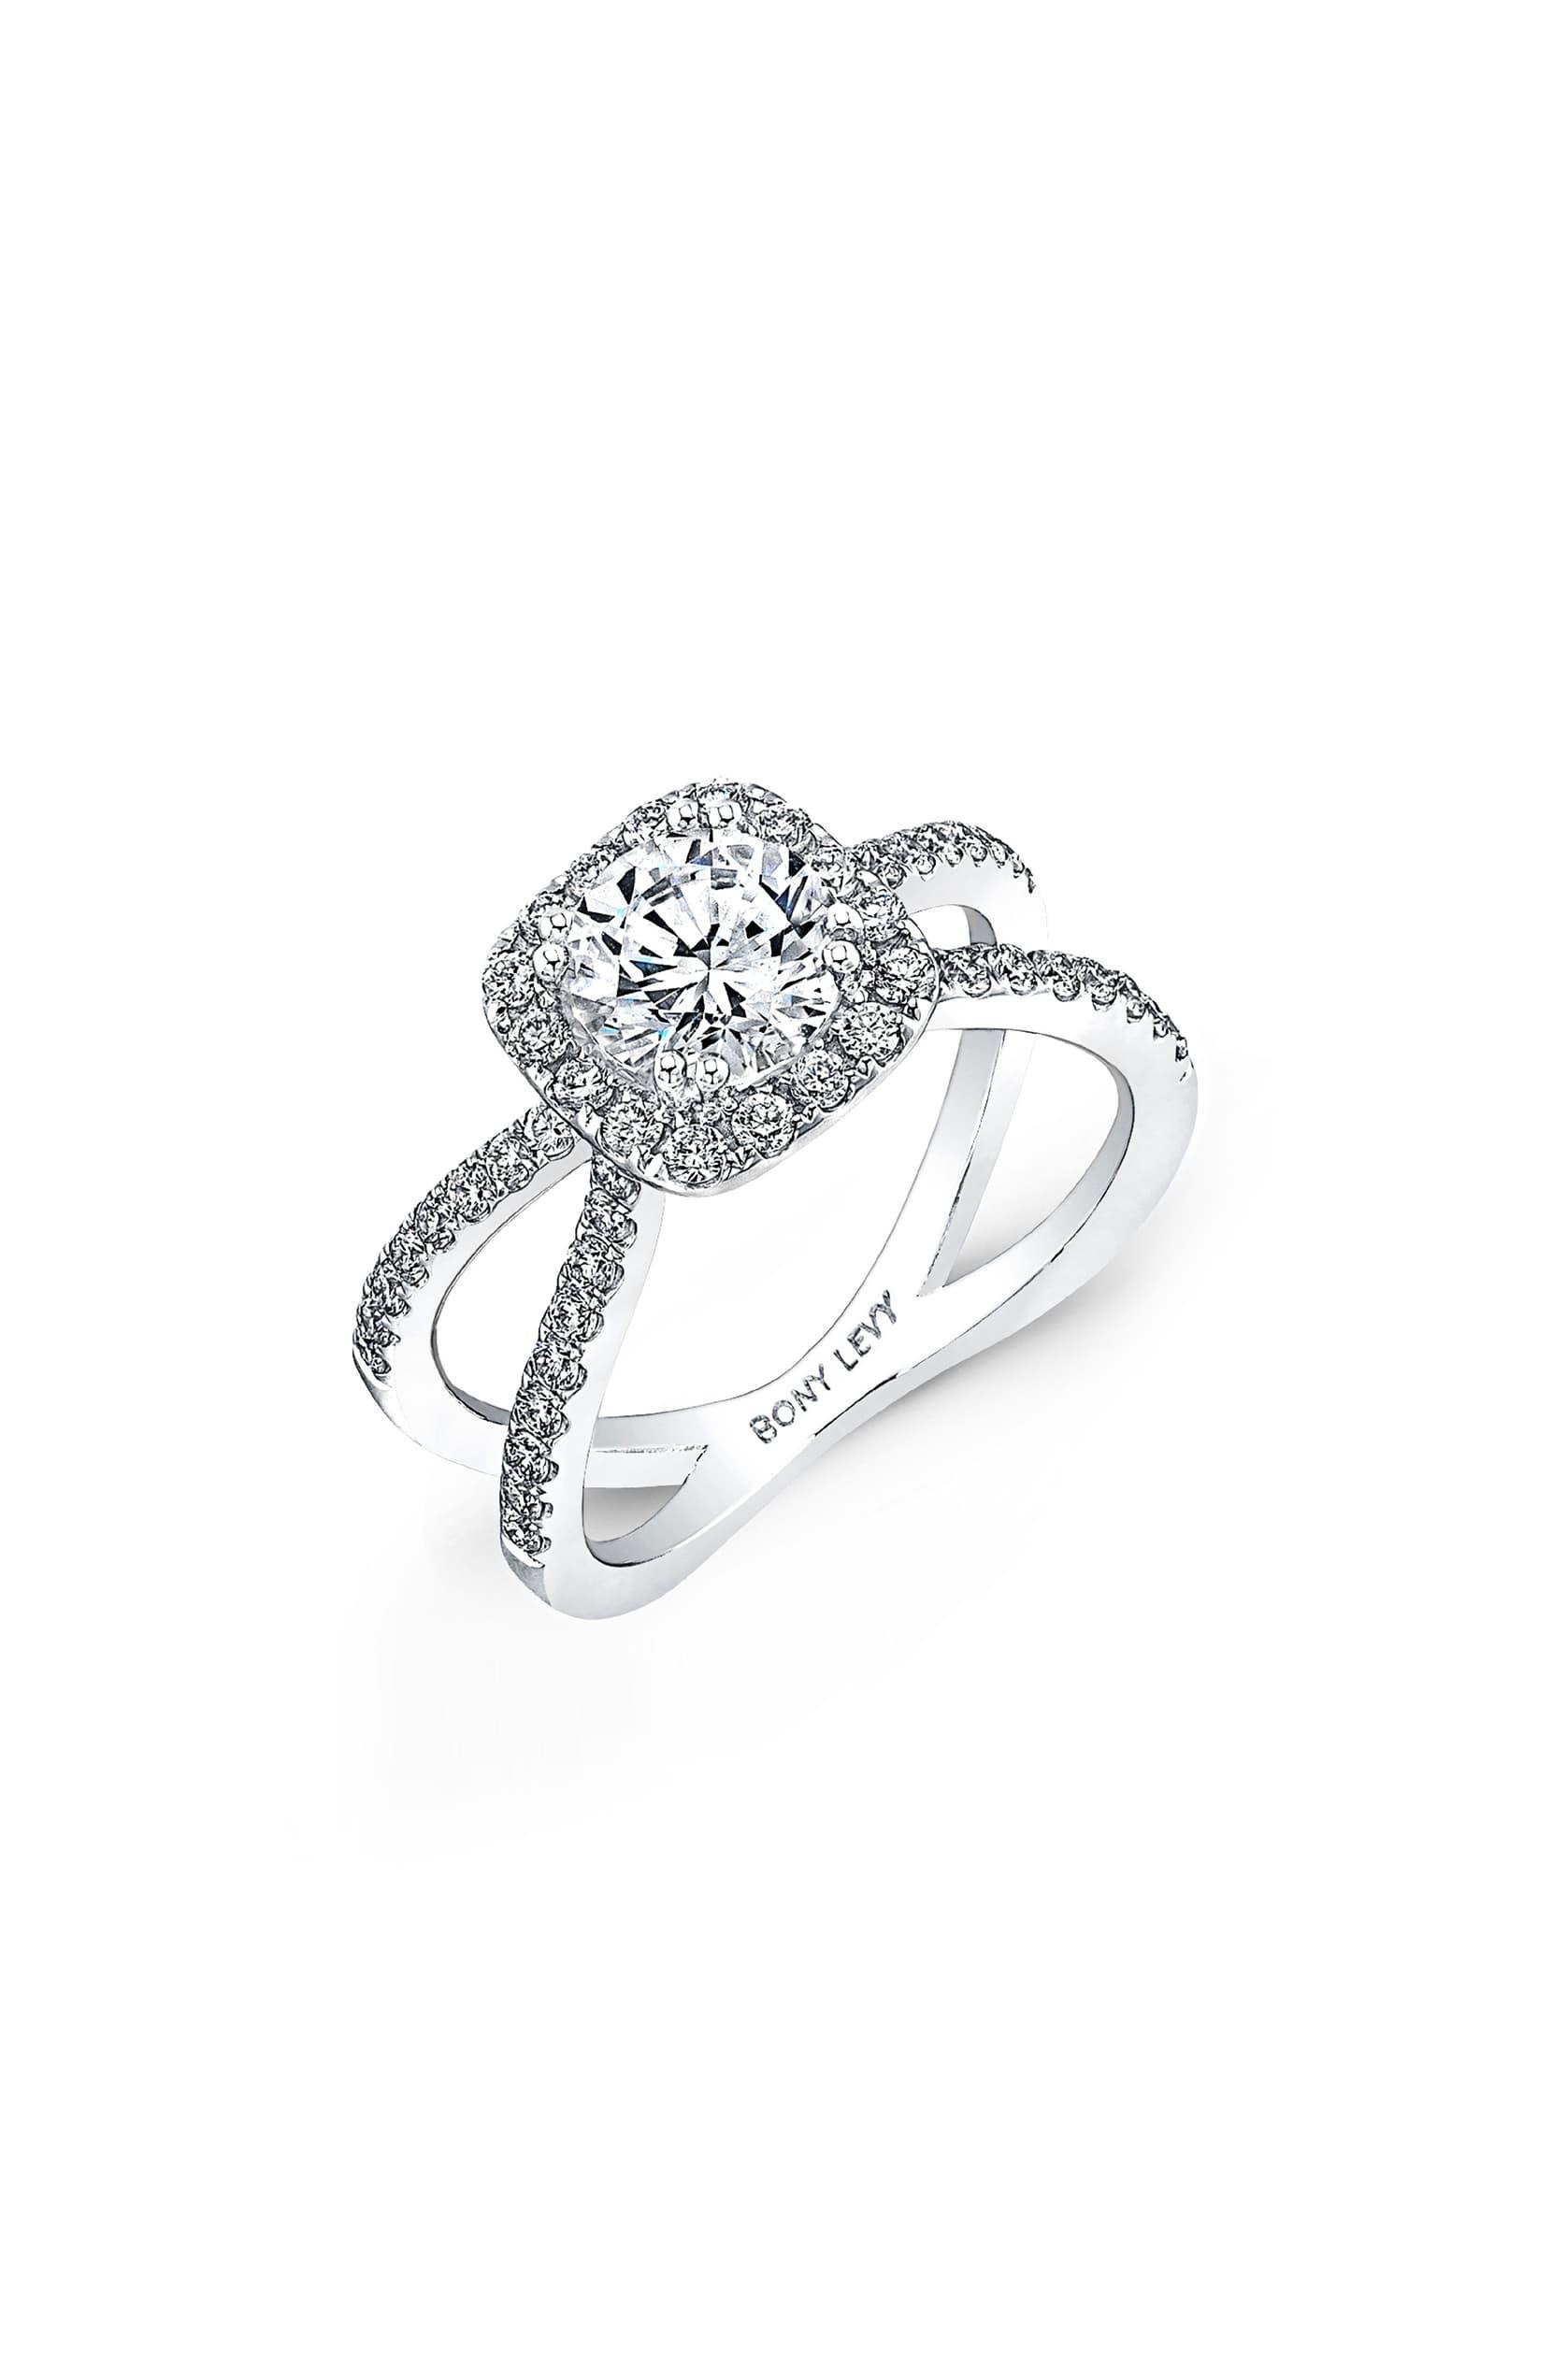 Pavé Diamond Split Shank Round Engagement Ring Setting